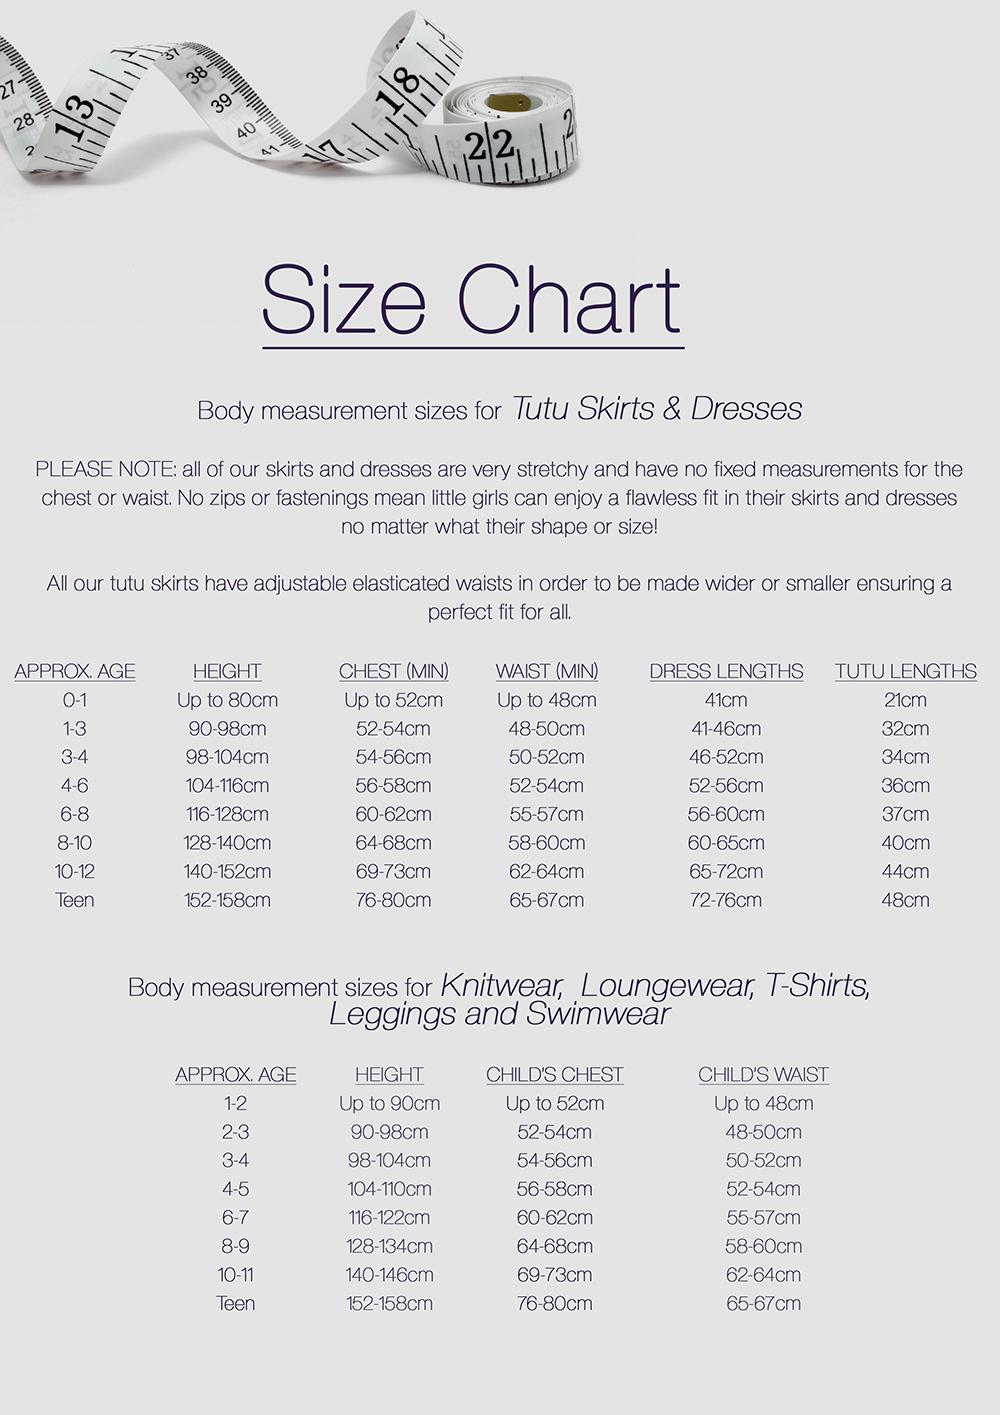 pauls-size-chart.jpg